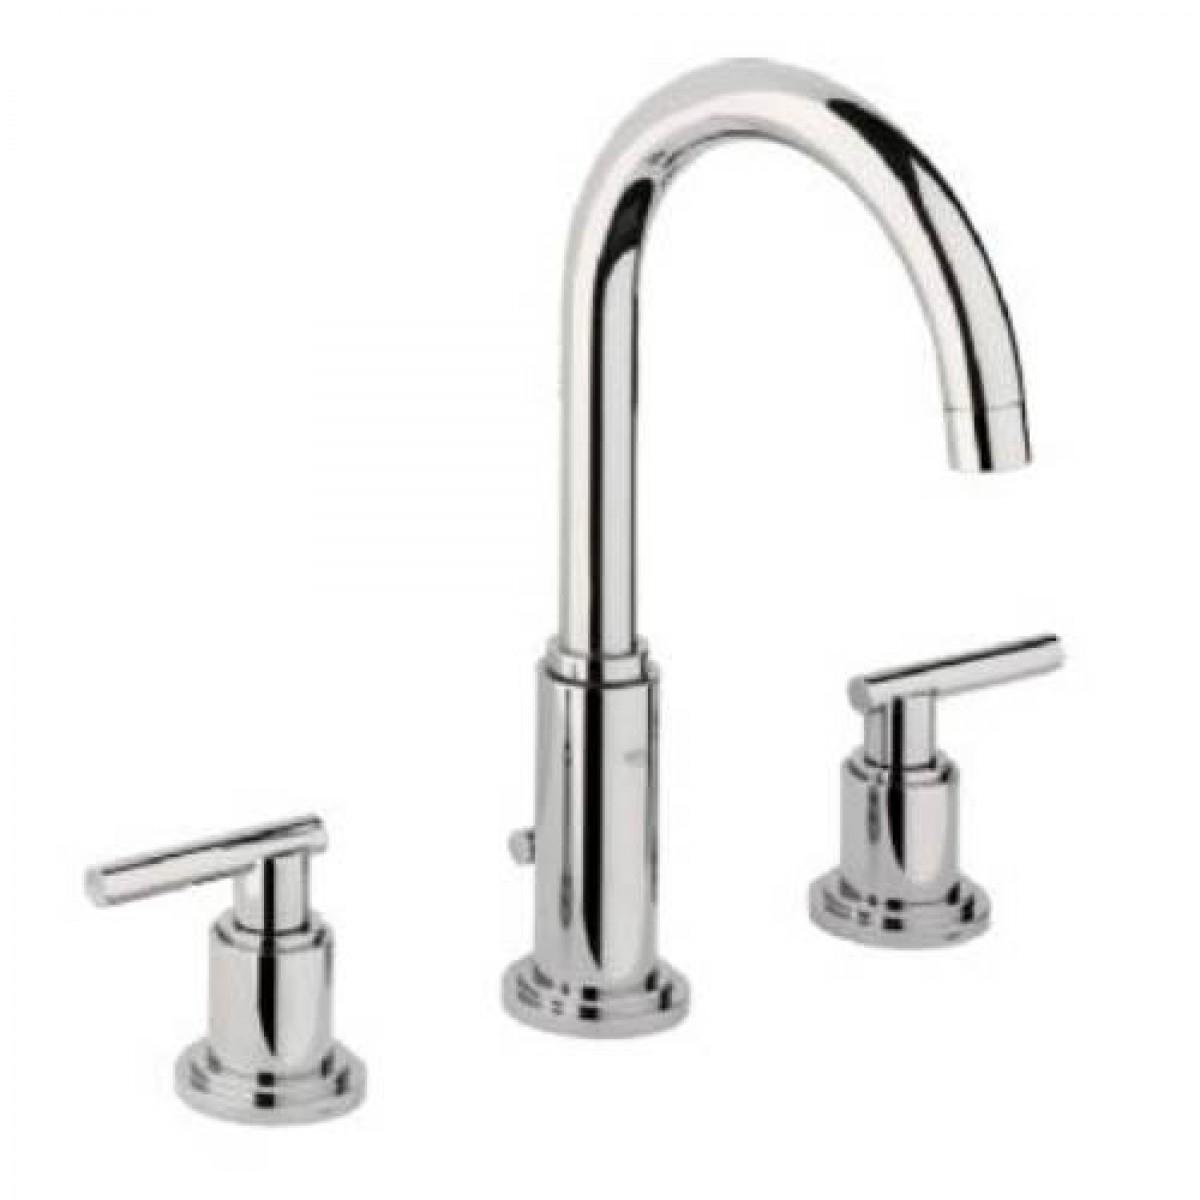 grohe atrio bar faucet grohe atrio bar faucet discobath grohe 20069 18027 atrio high spout widespread bathroom 1200 x 1200 1